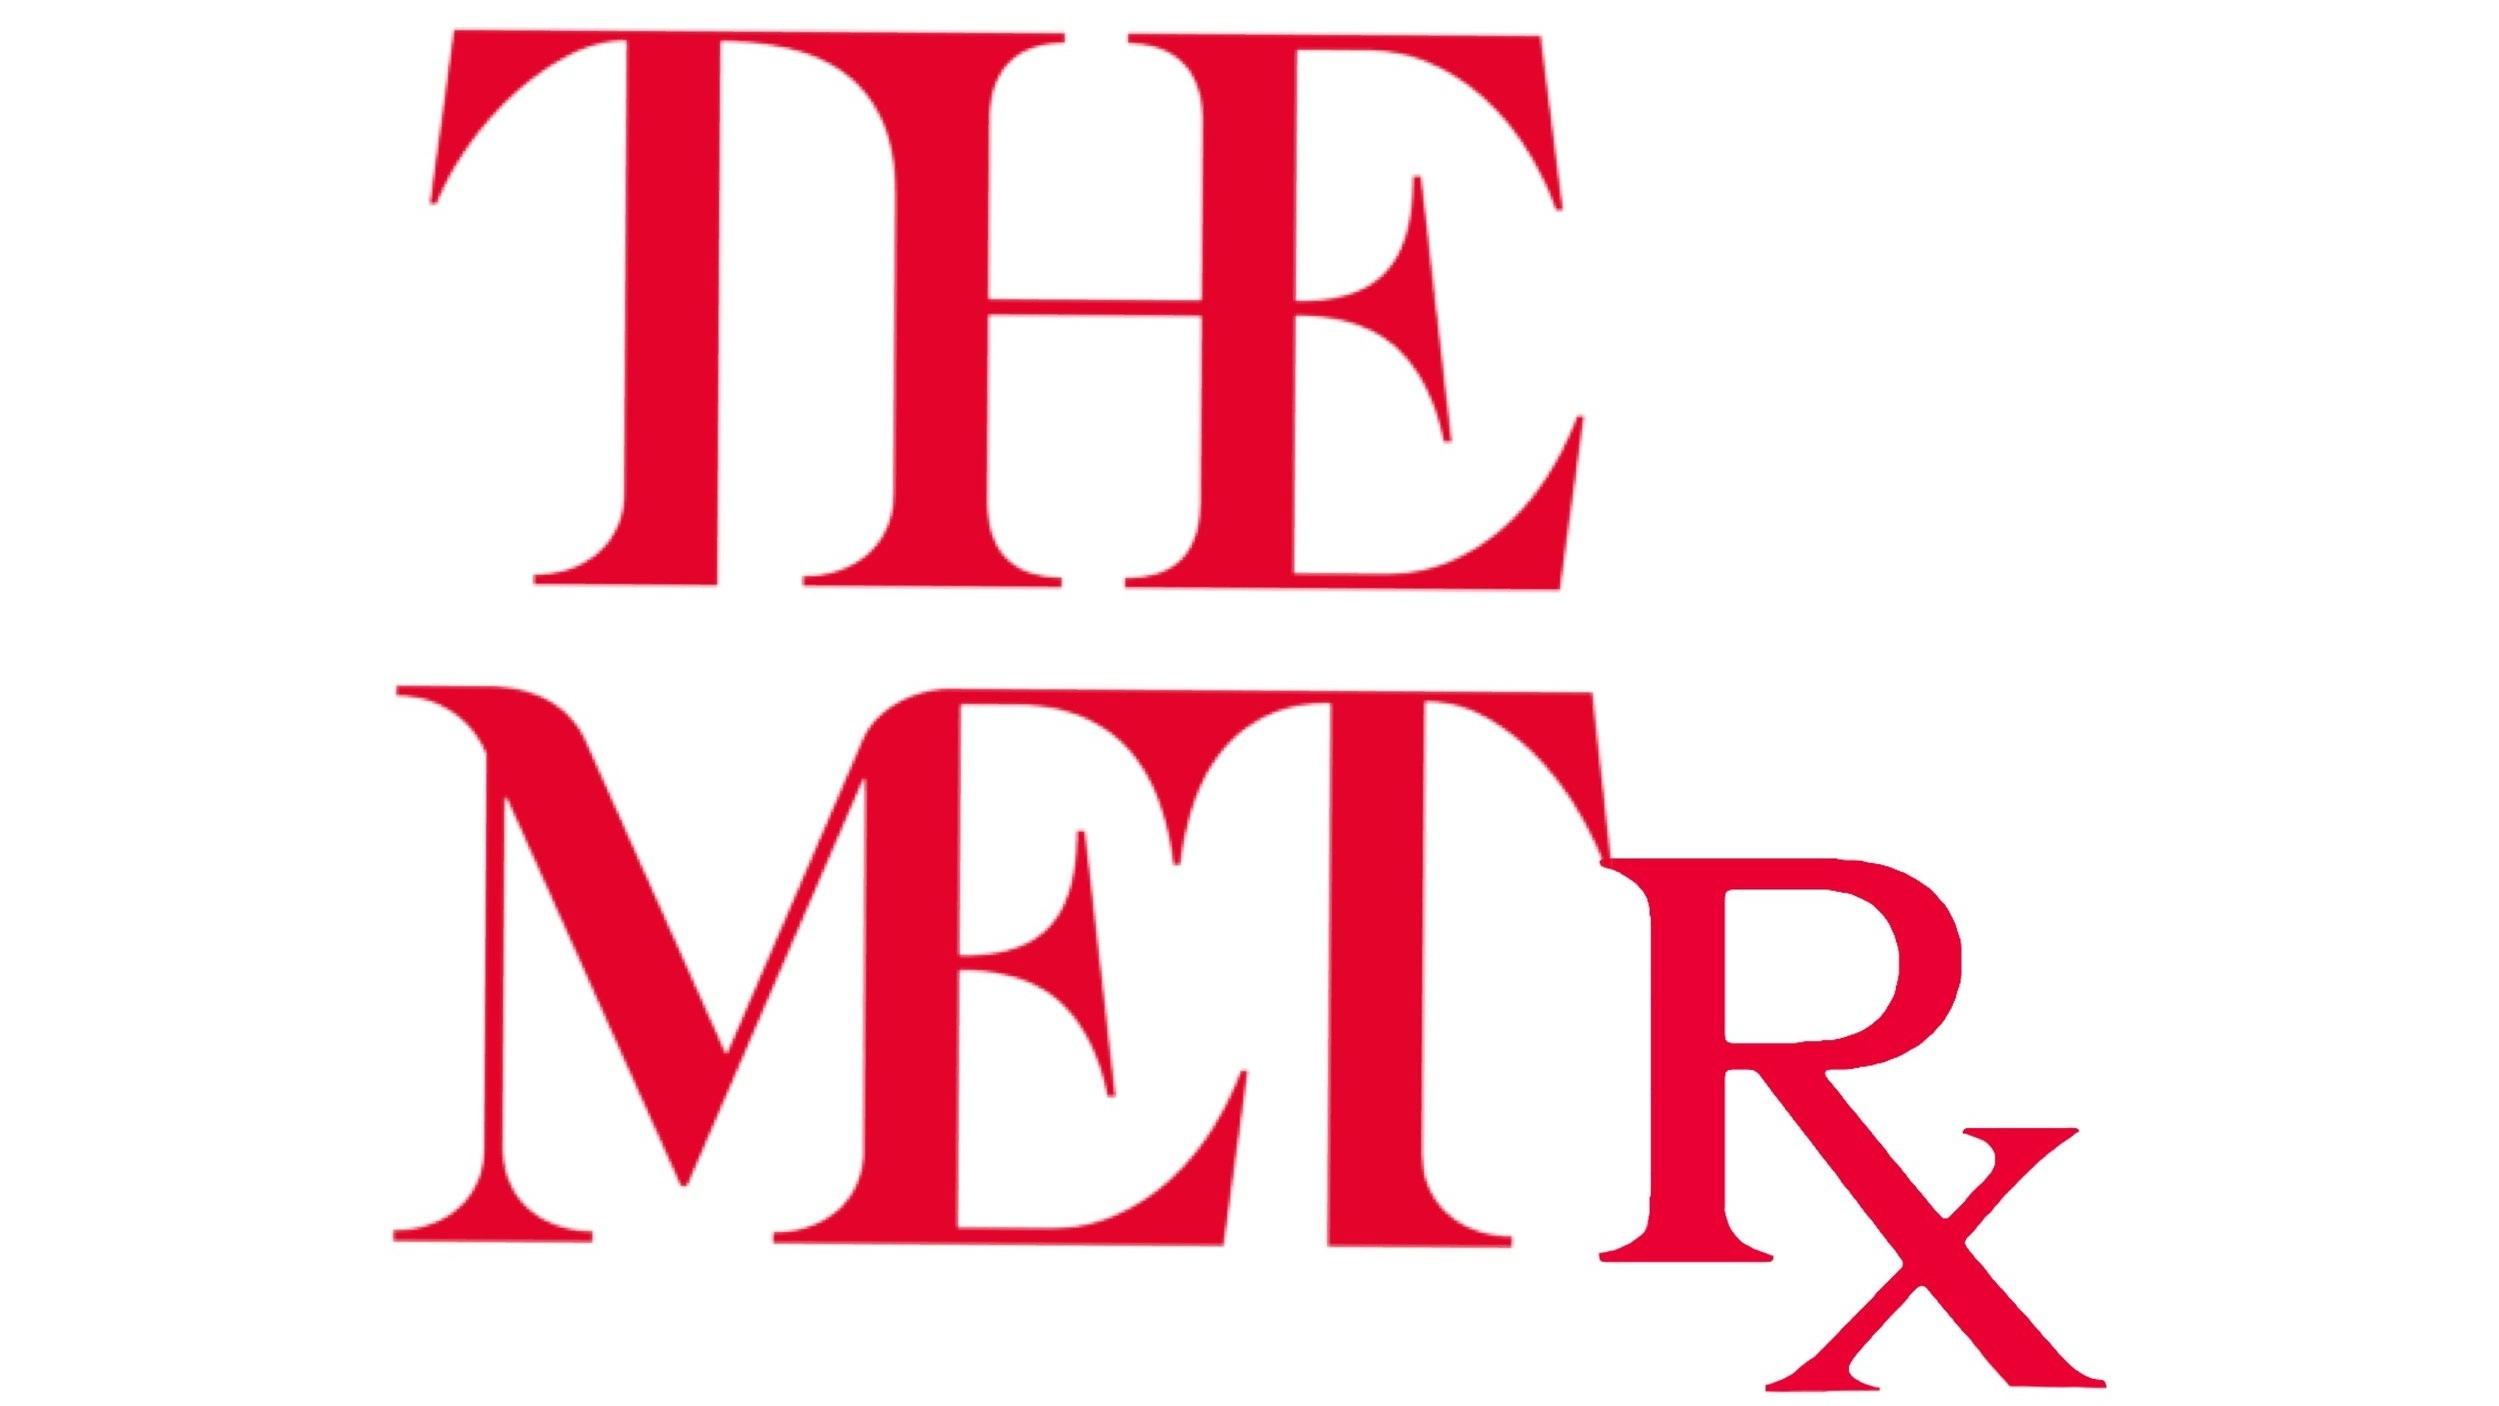 THE METRX Met logo & text digital collage. 2019 16:9